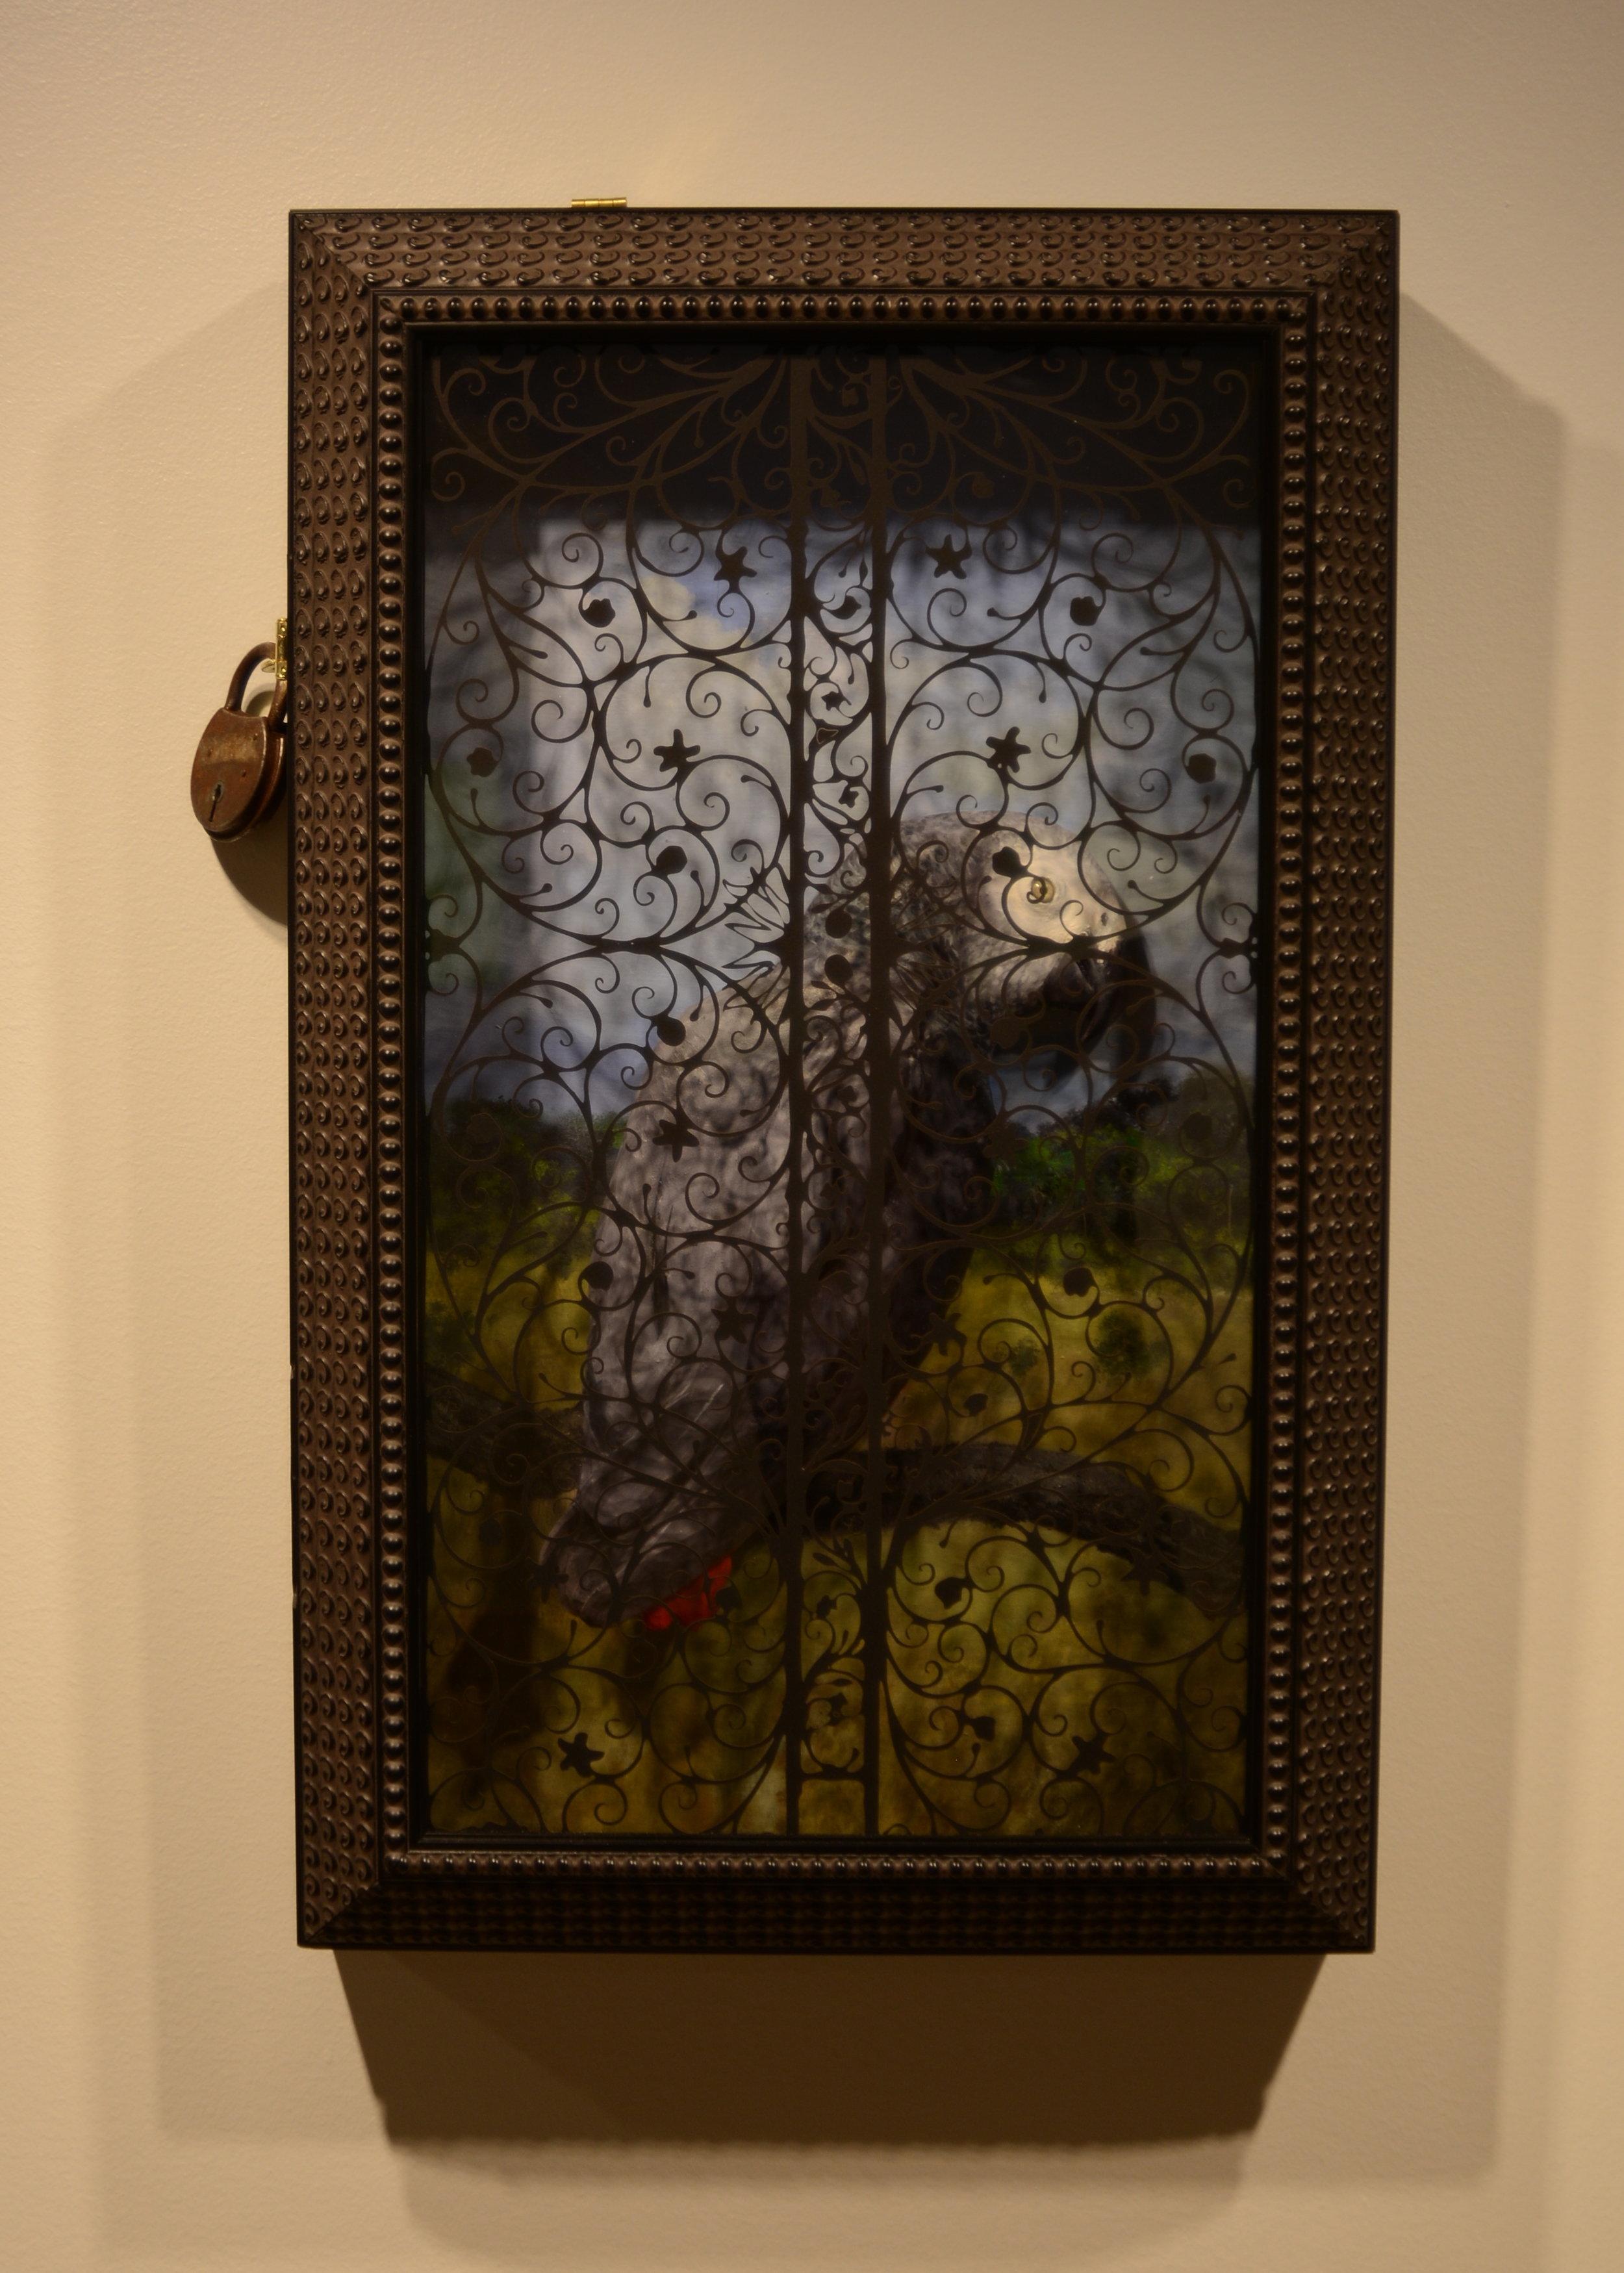 Parrot Indulgences by Nicholas Jainschigg